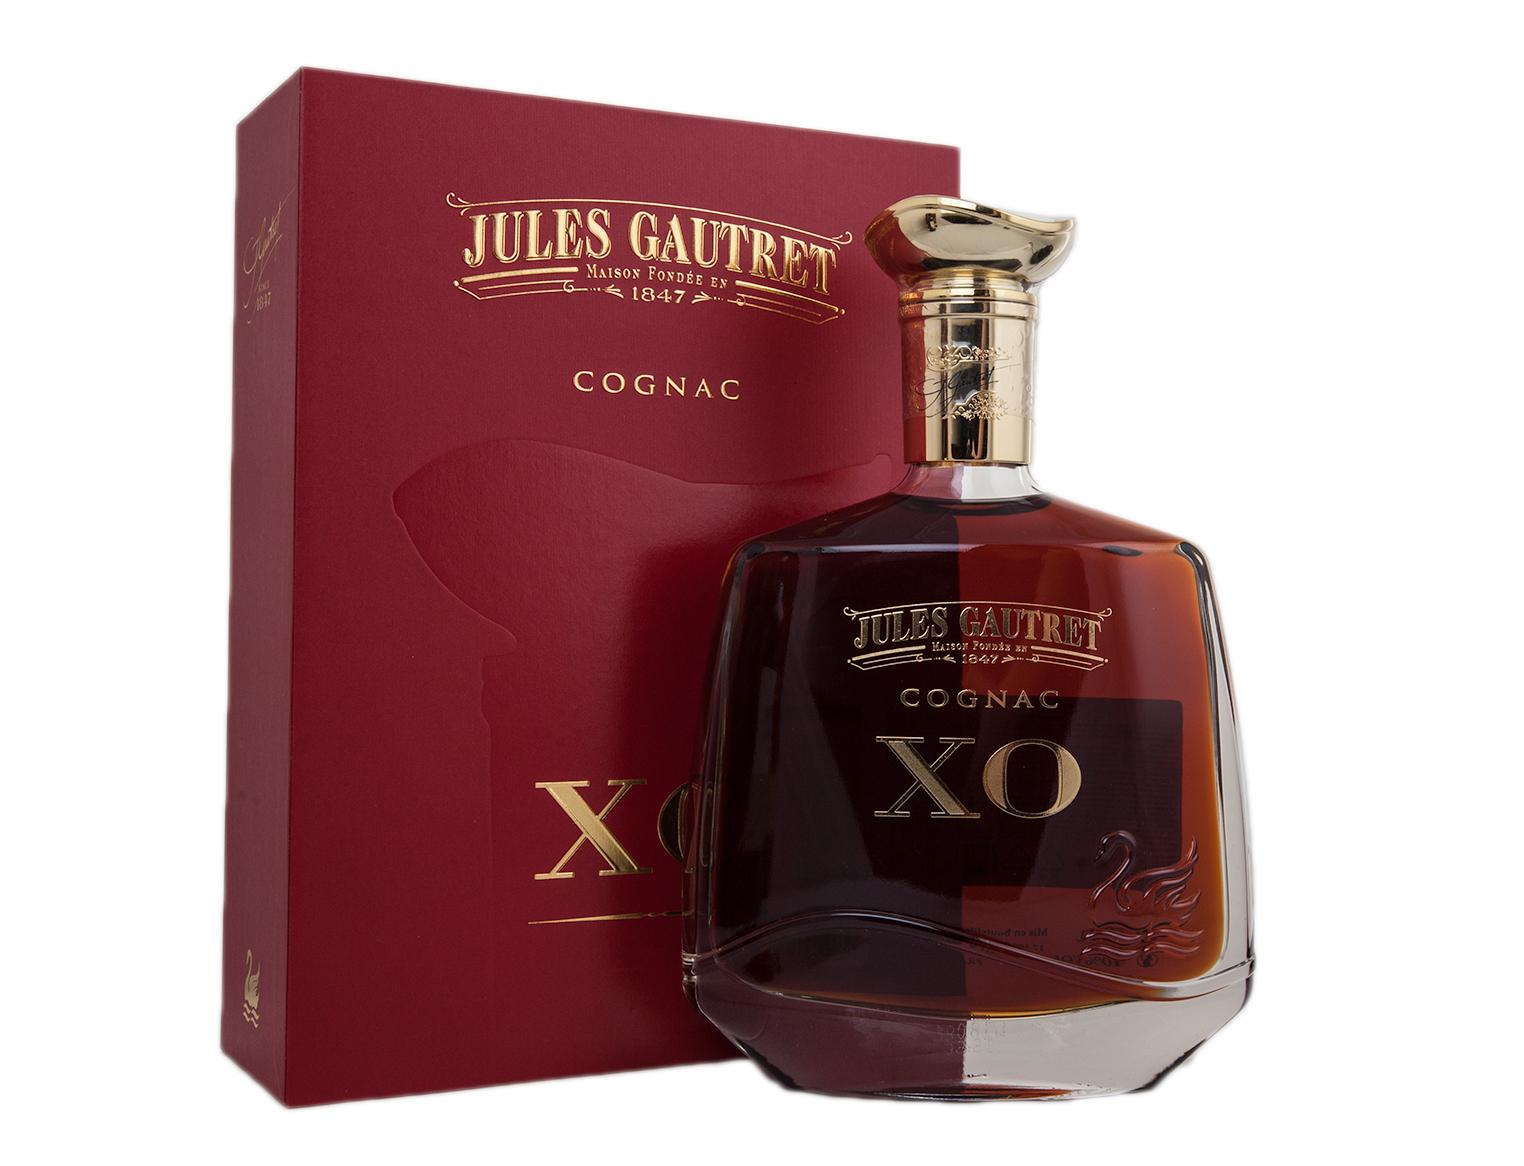 Jules Gautret XO gift box - купить коньяк Жюль Готре XO 0.7 л в п/у (красная) - цена